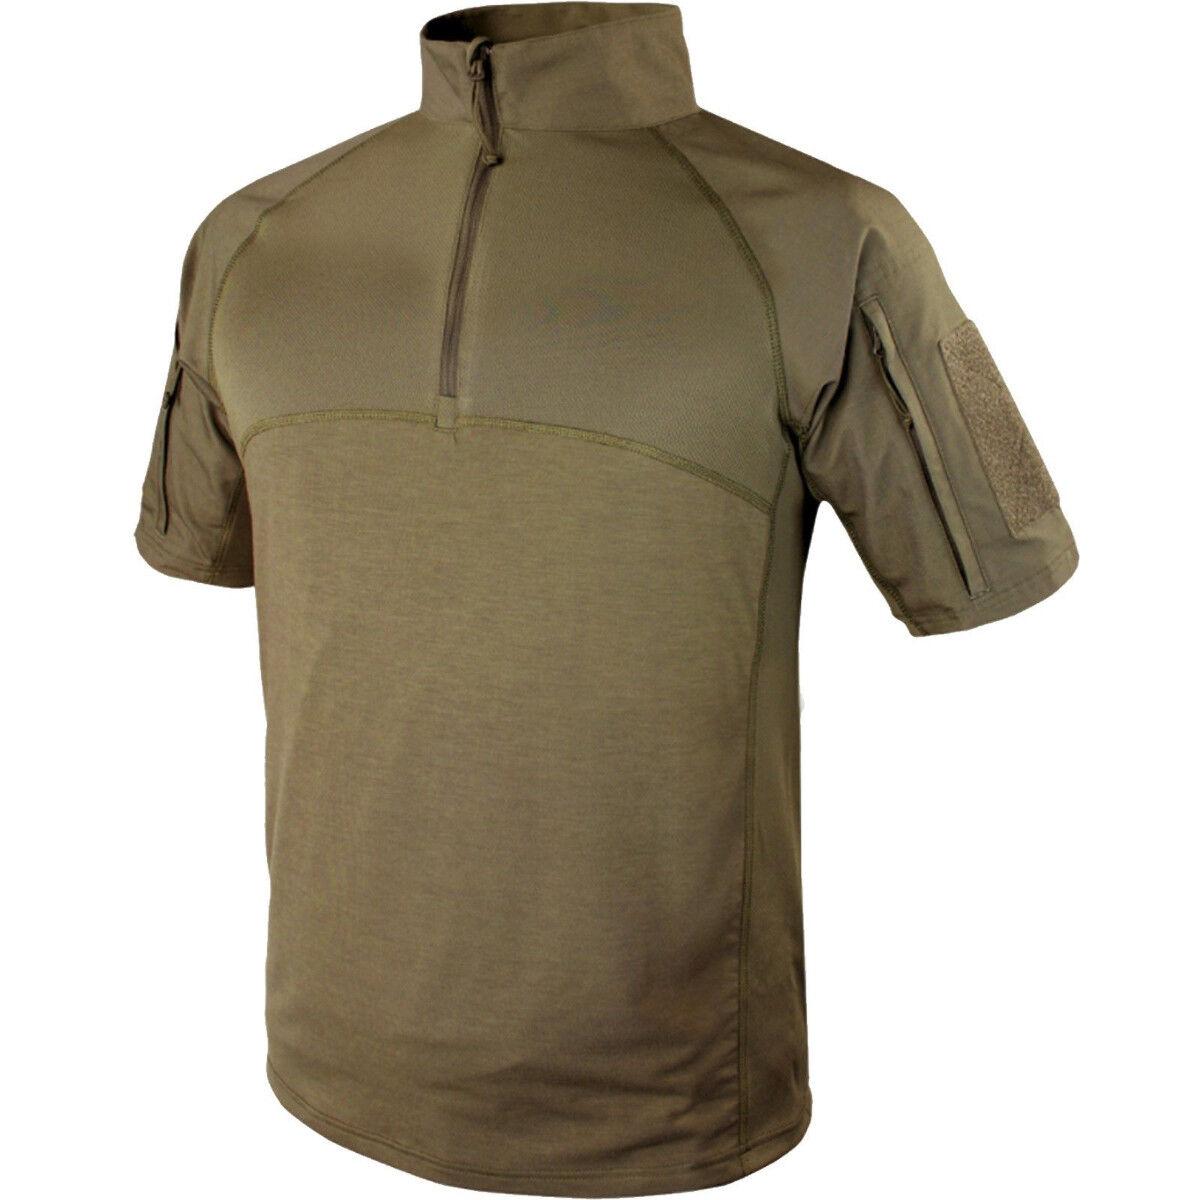 Condor Short  Sleeve Combat Shirt - Tan - XL - New - 101144-003-XL  the newest